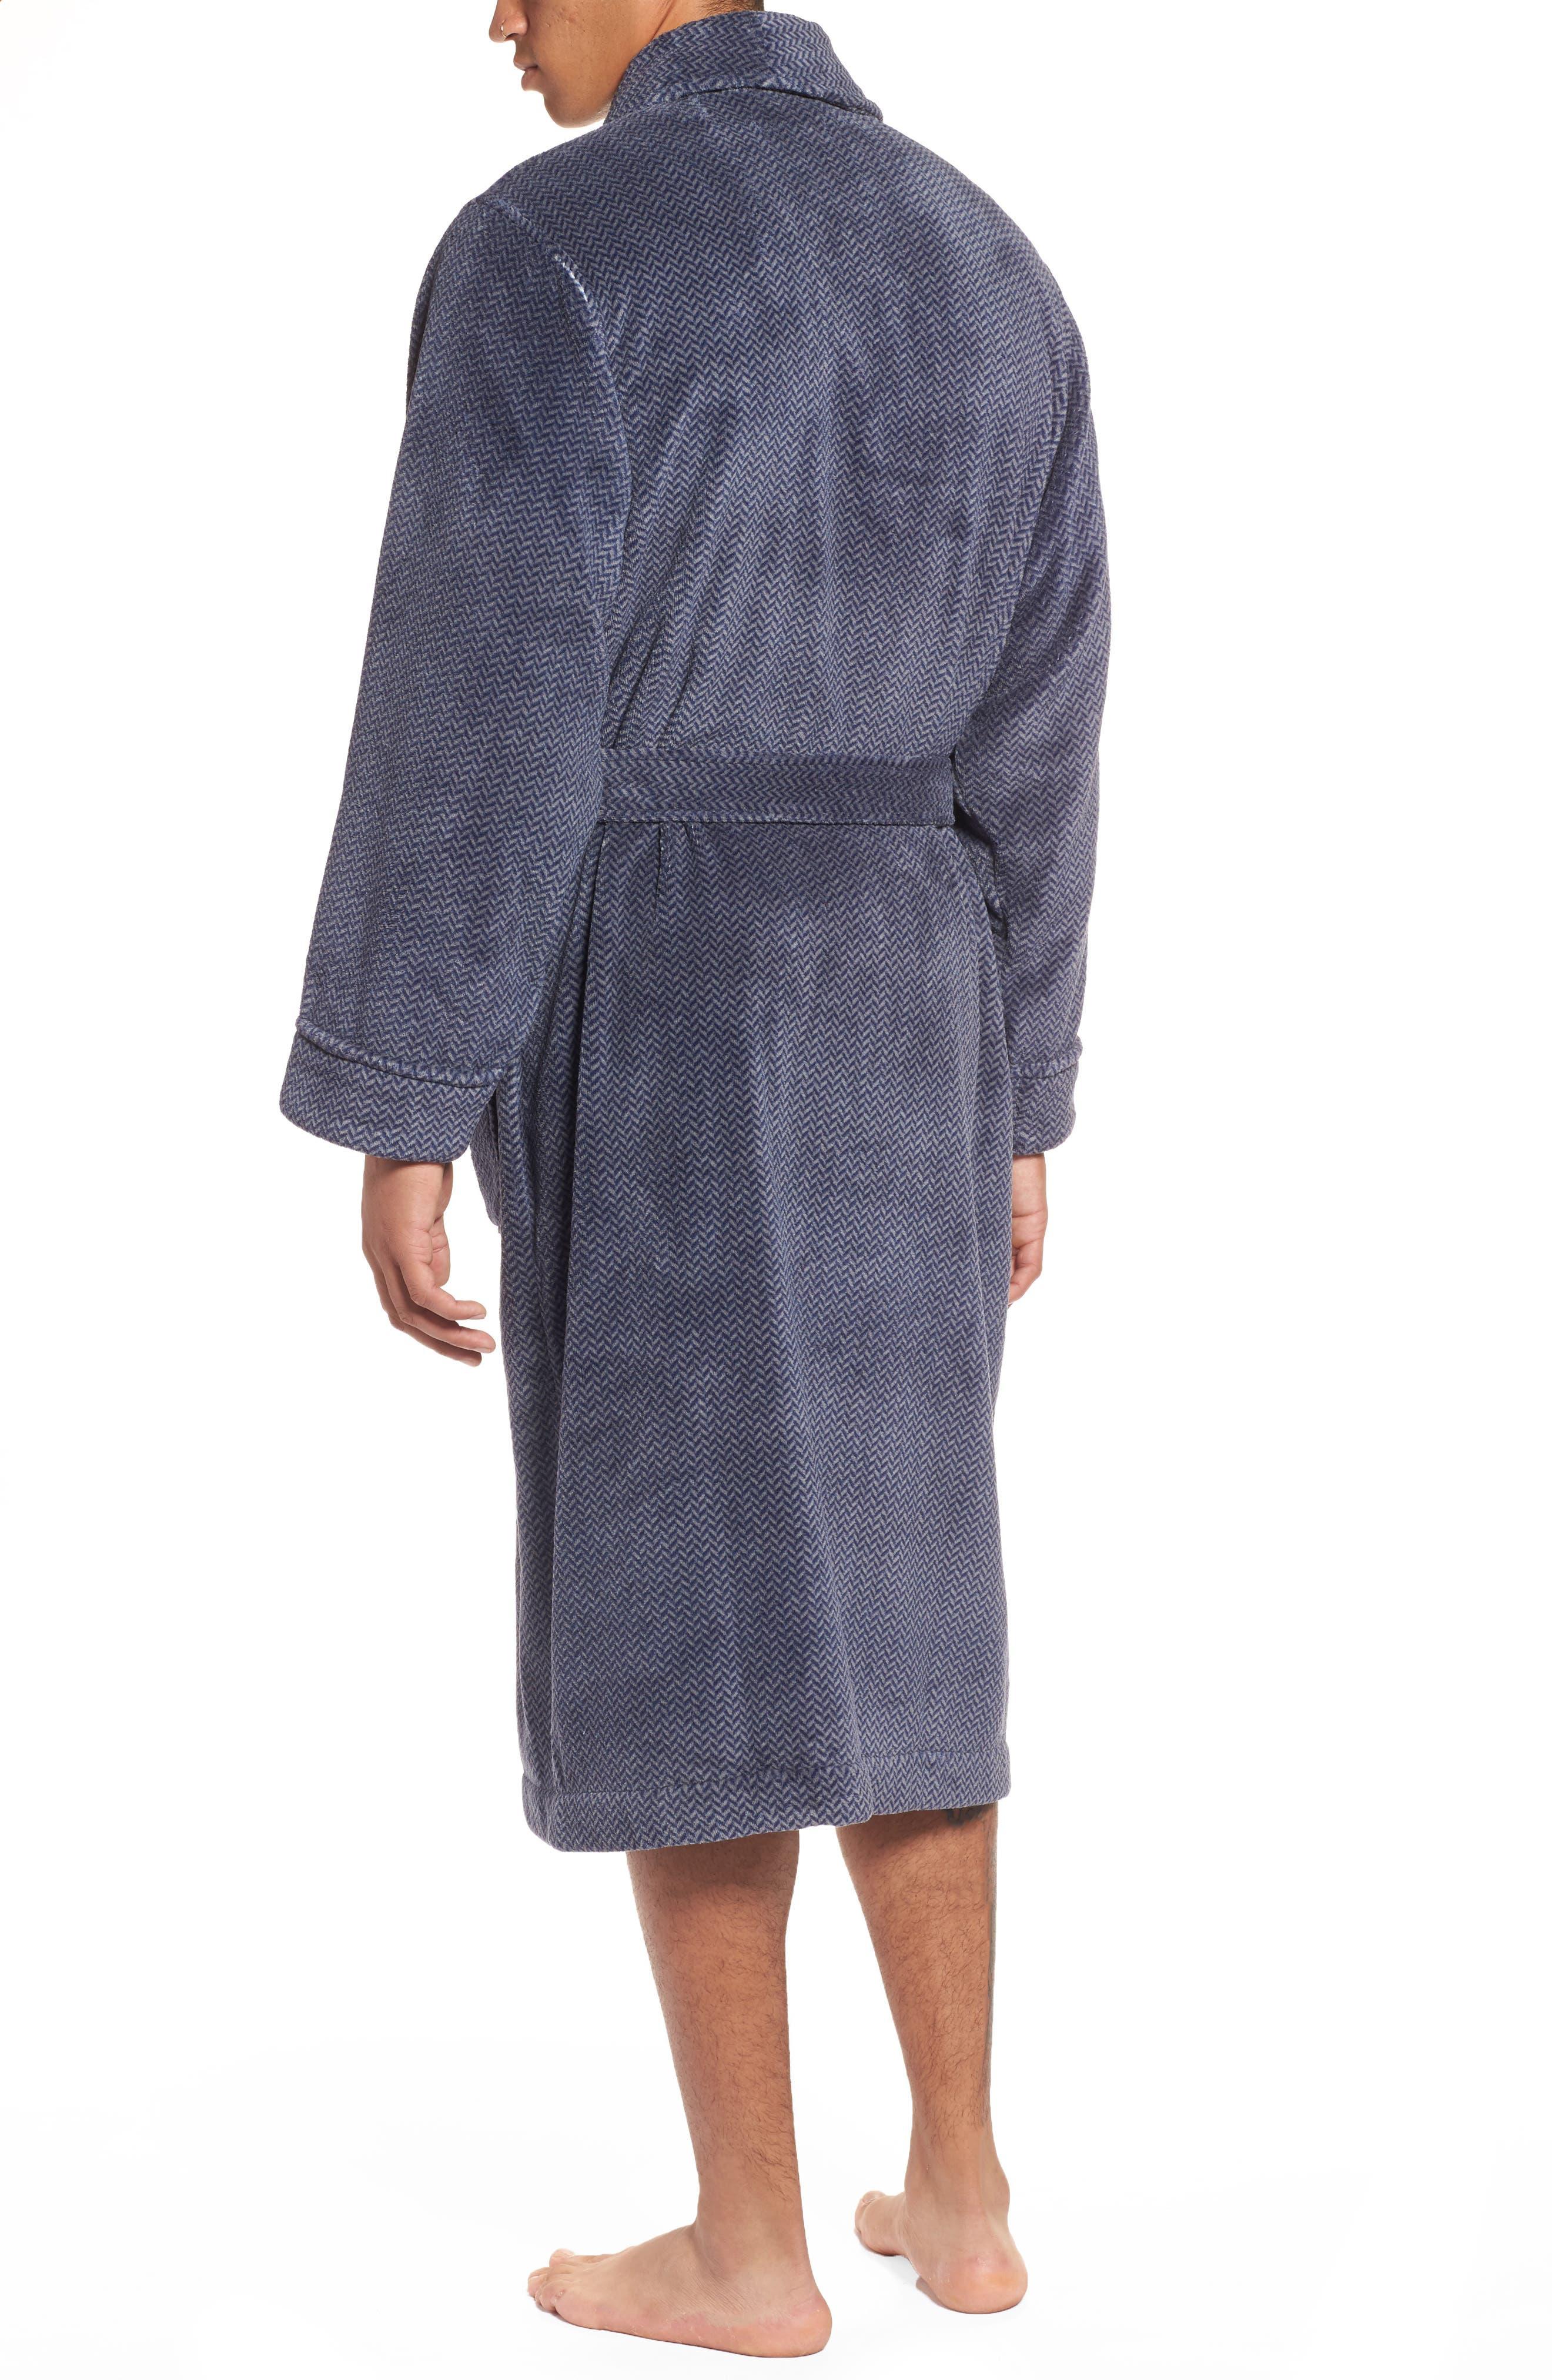 Herringbone Fleece Robe,                             Alternate thumbnail 3, color,                             Navy Indigo- Grey Herringbone